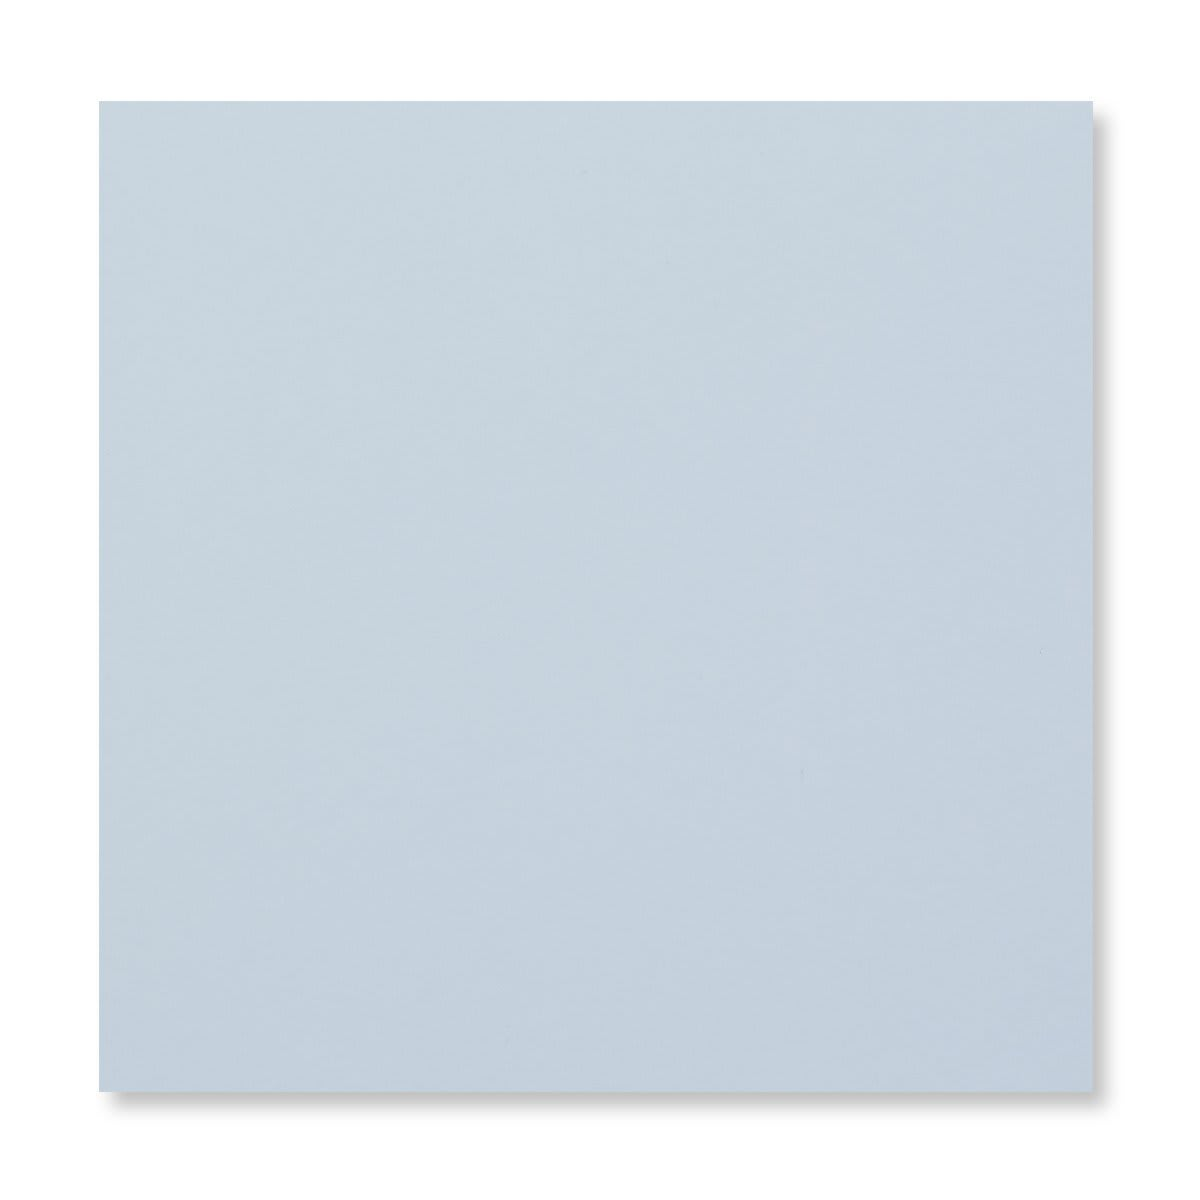 PALE BLUE 155MM SQUARE PEEL & SEAL ENVELOPES